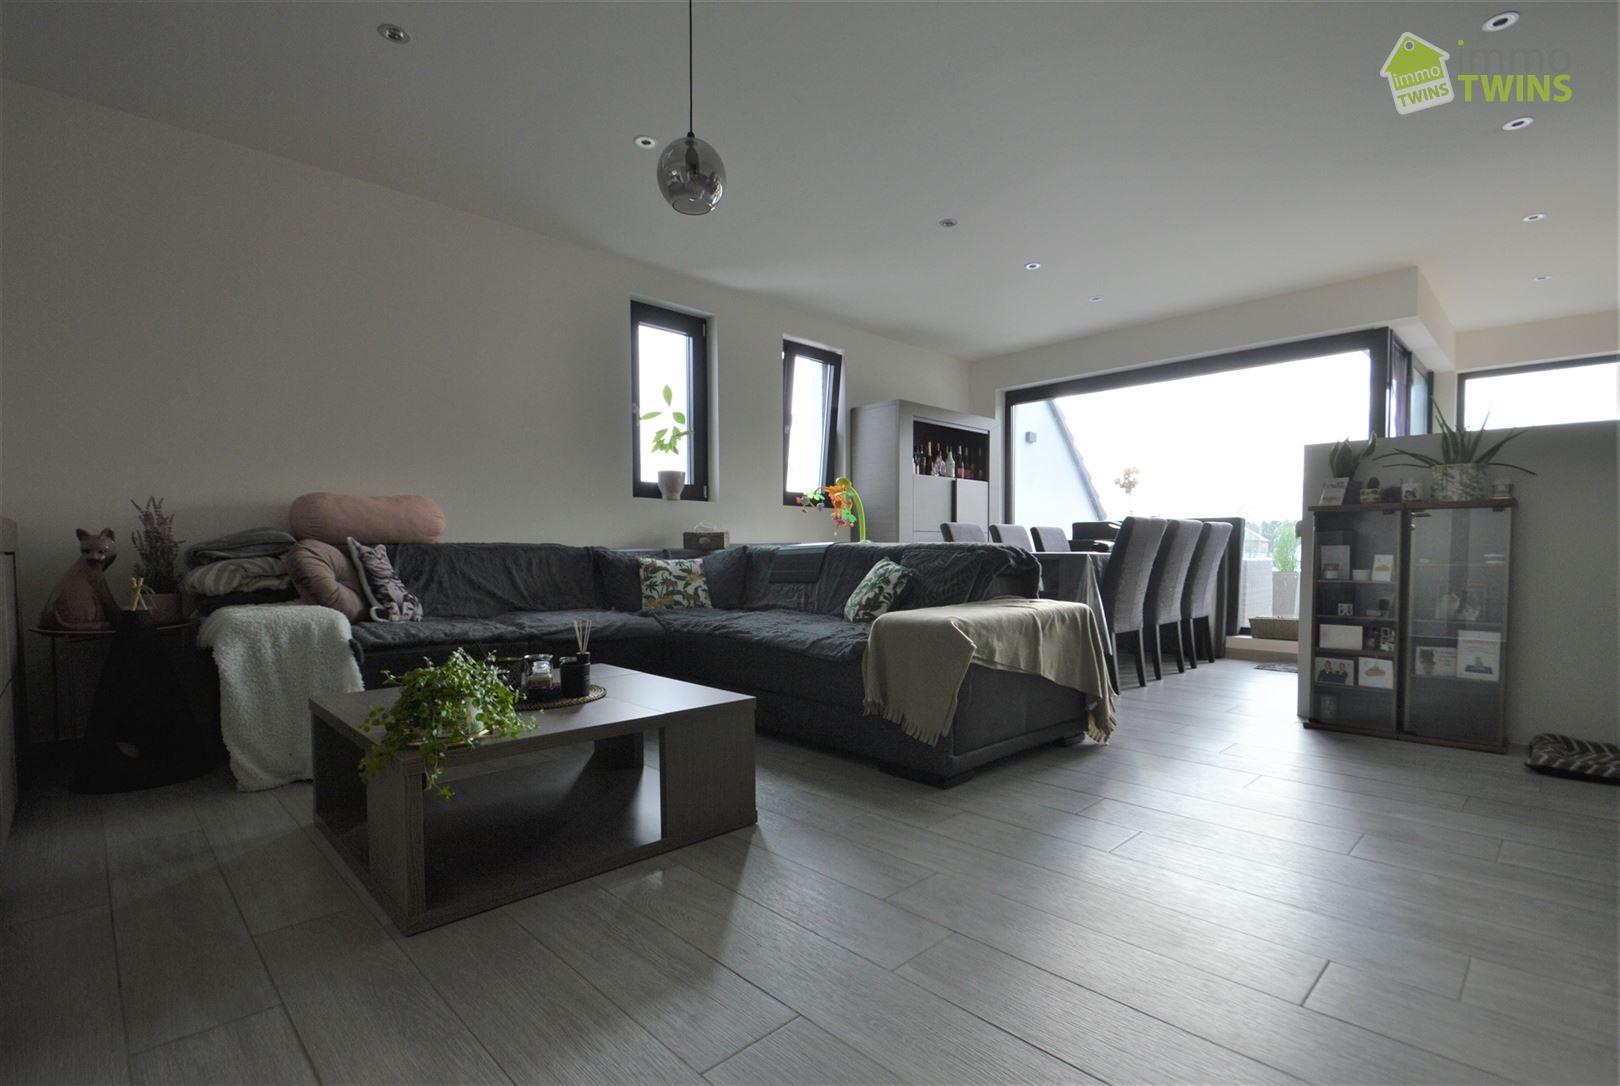 Foto 3 : Appartement te 9280 LEBBEKE (België) - Prijs € 810